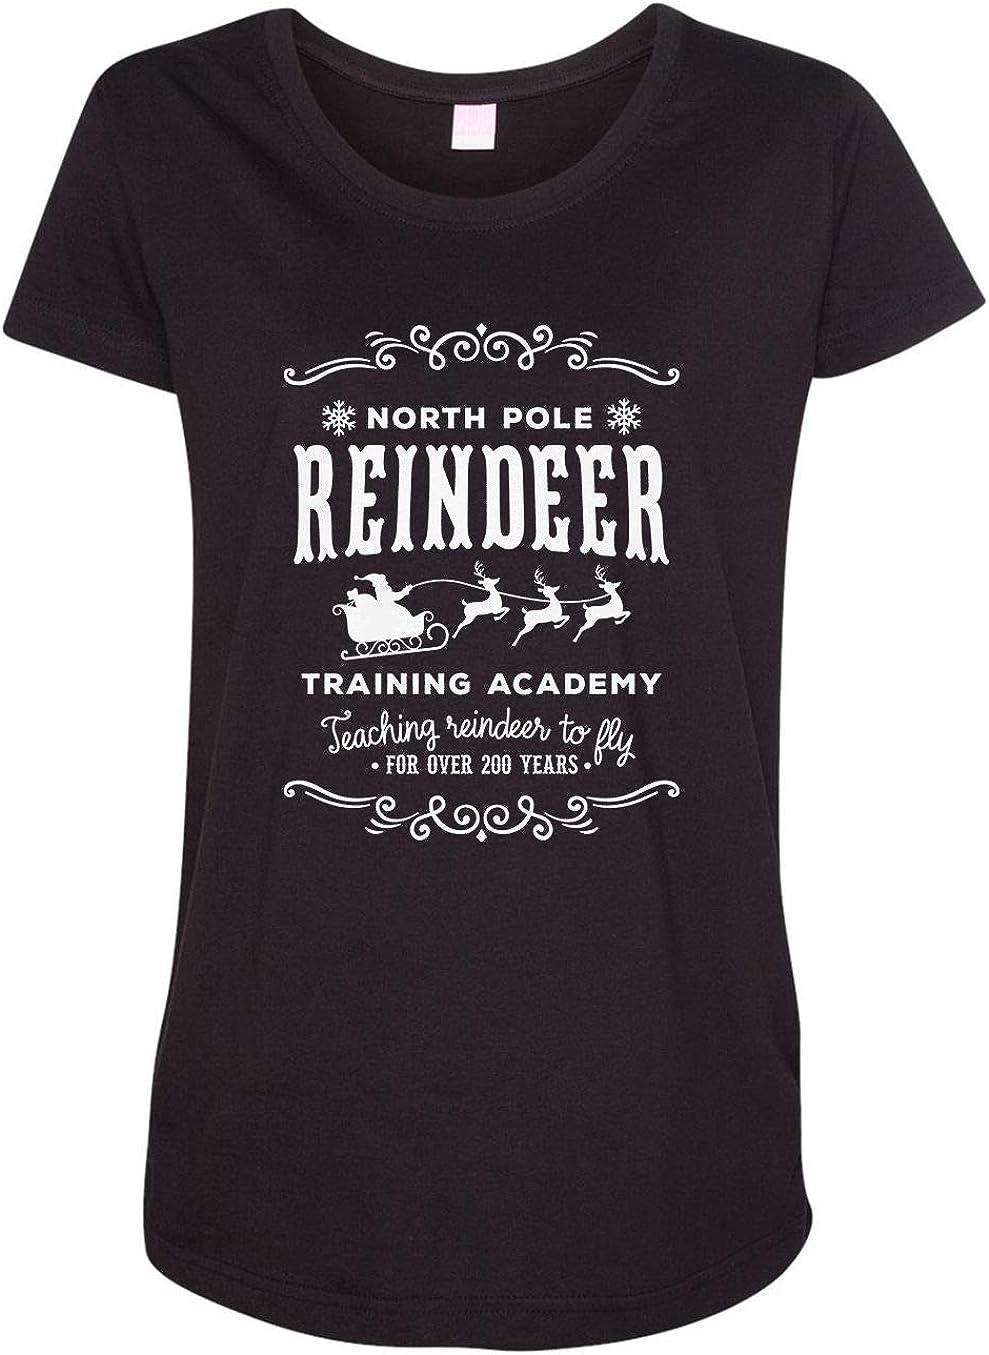 HARD EDGE DESIGN Women's North Pole Reindeer Training Academy T-Shirt